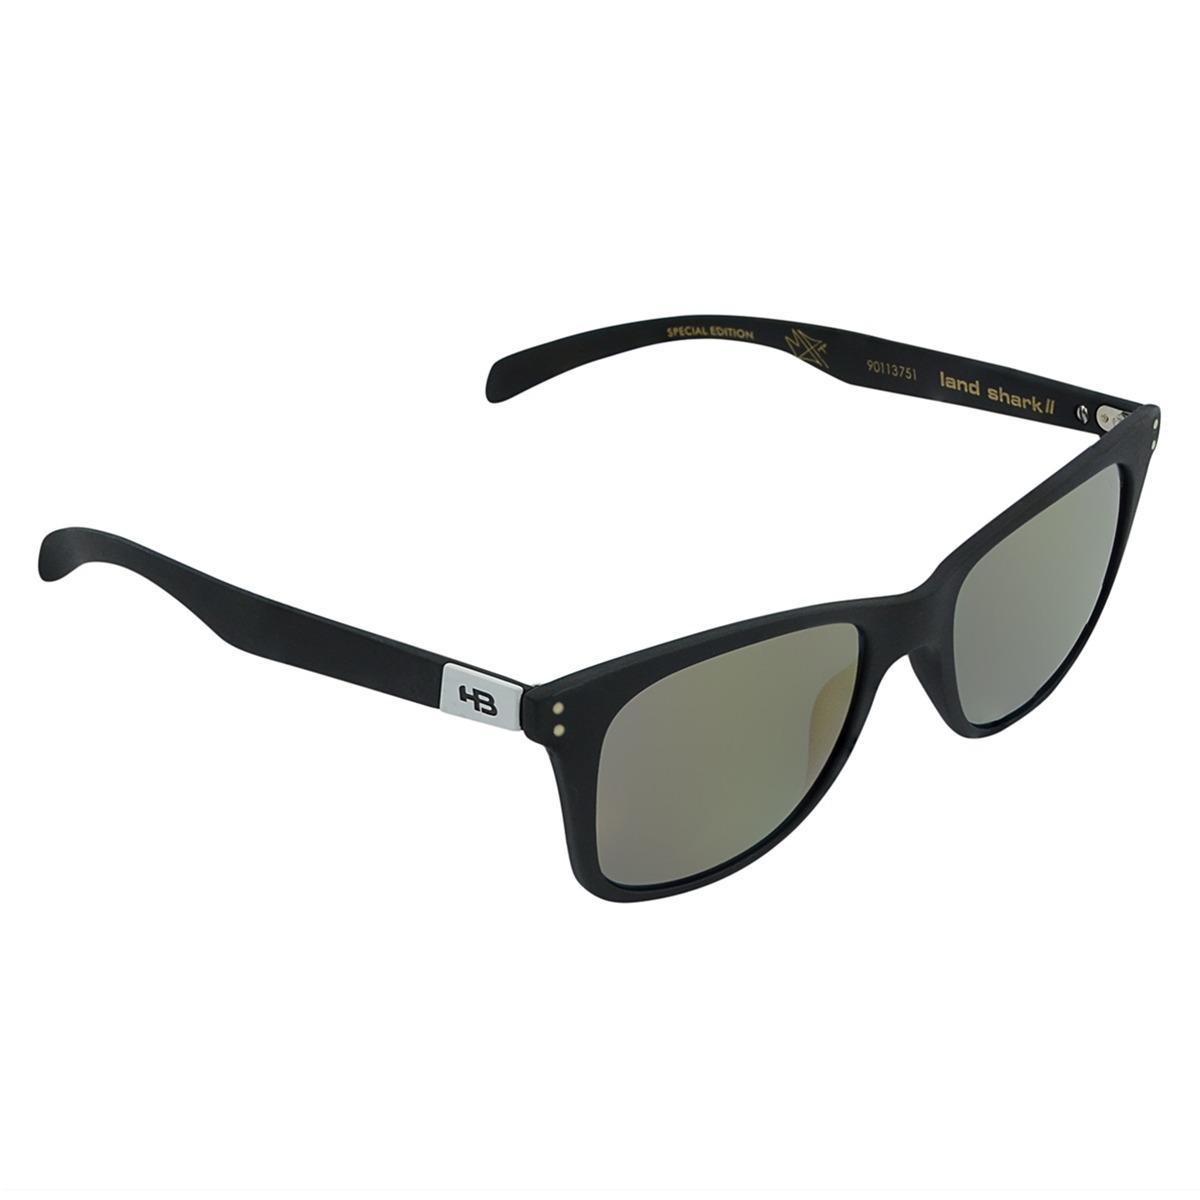 Óculos Masculino Hb Landshark Ii Preto Fosco - R  399,90 em Mercado ... 39d7ce7d66